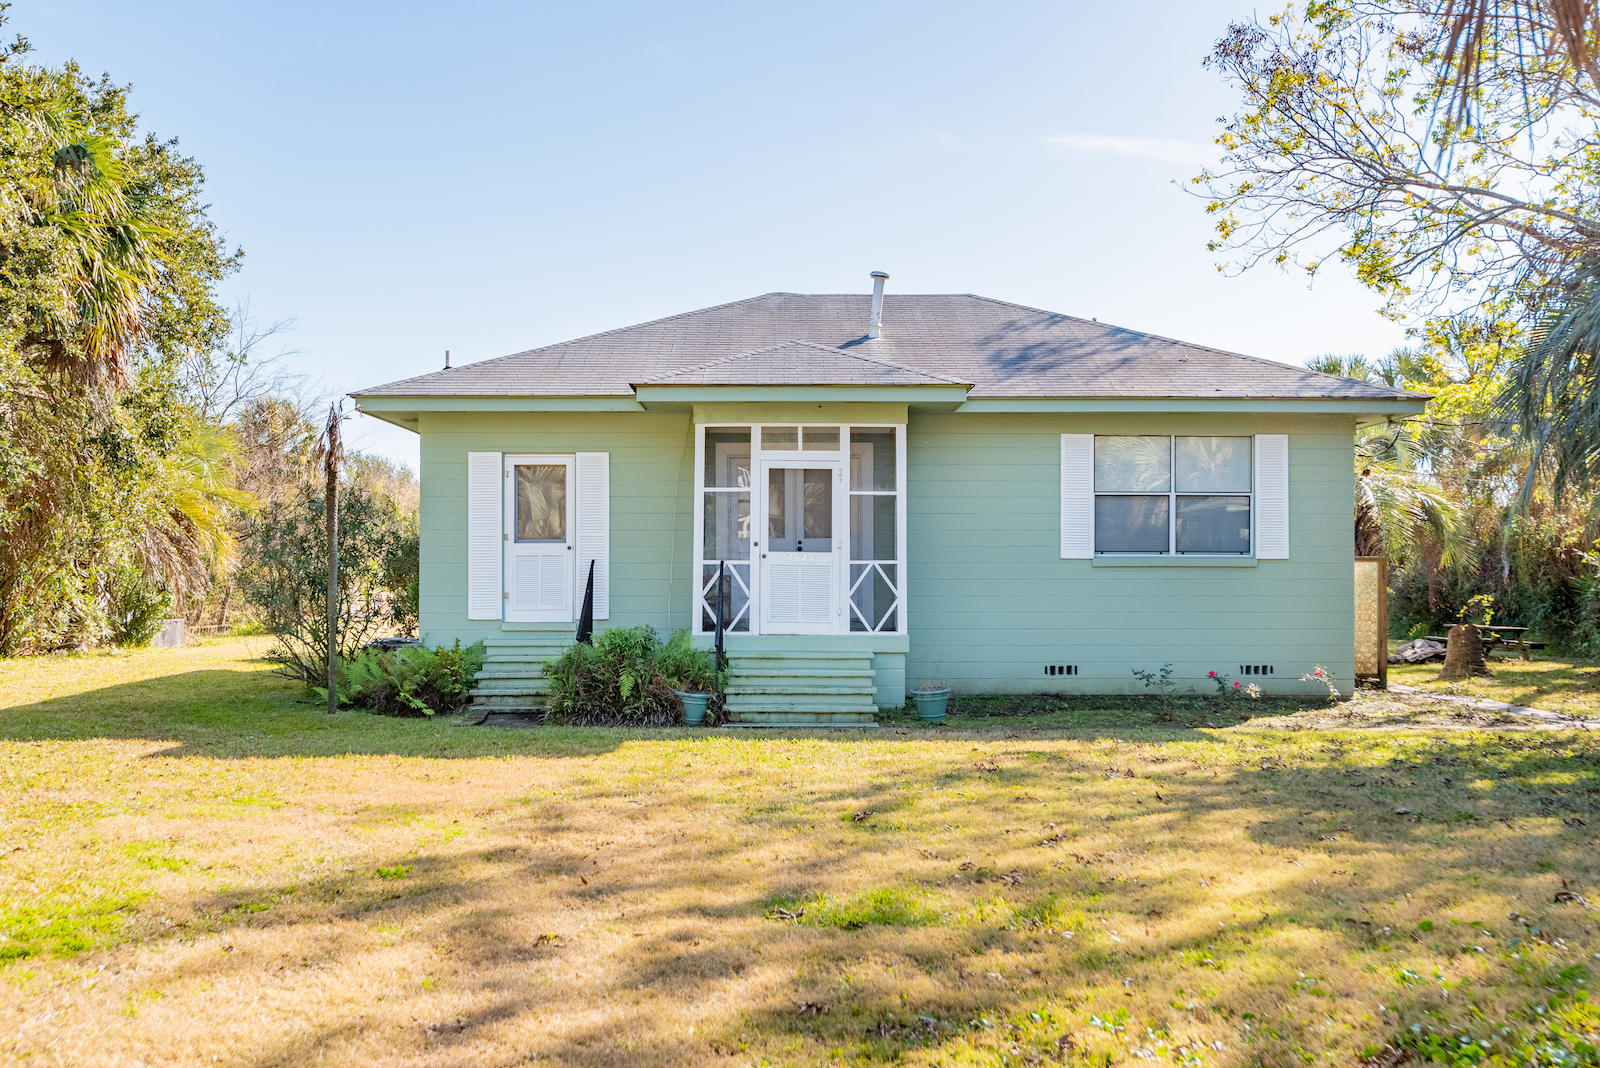 Sullivans Island Homes For Sale - 2525 Atlantic, Sullivans Island, SC - 12